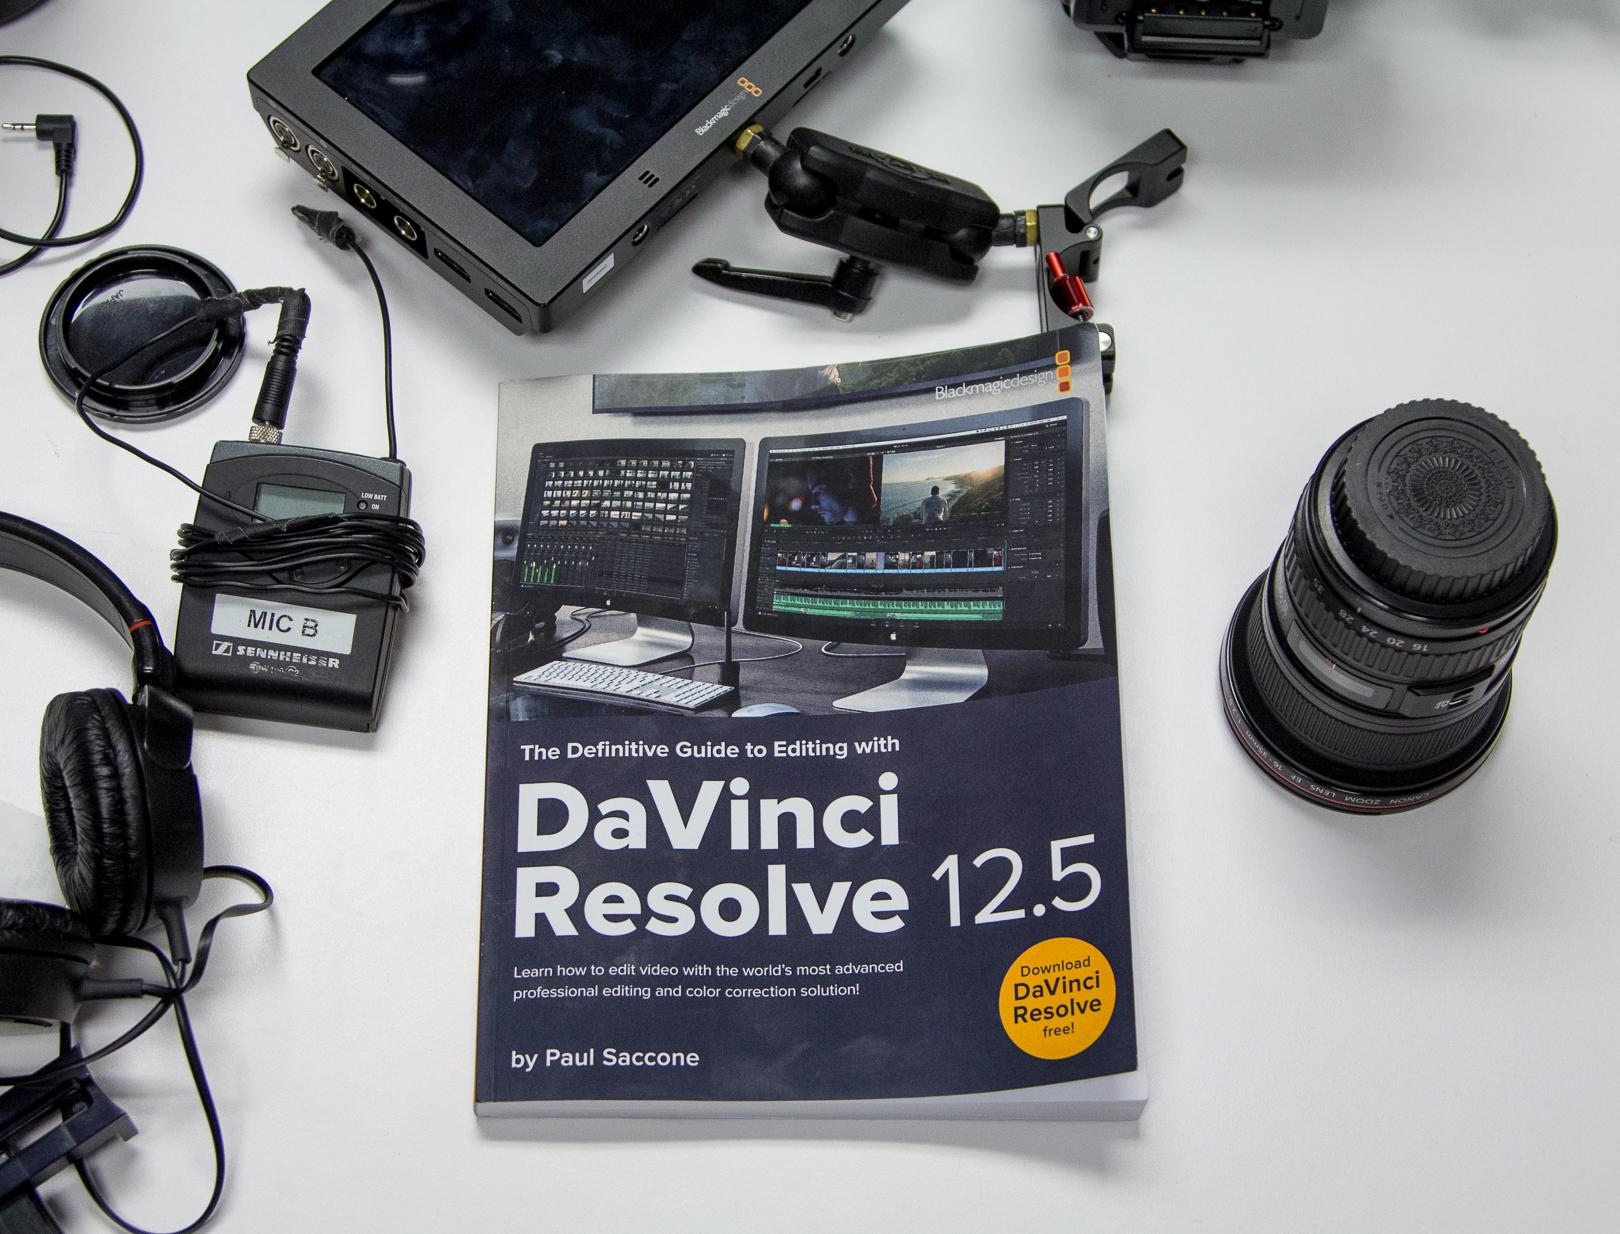 DaVinci Resolve 12.5 Editing Book Review 20